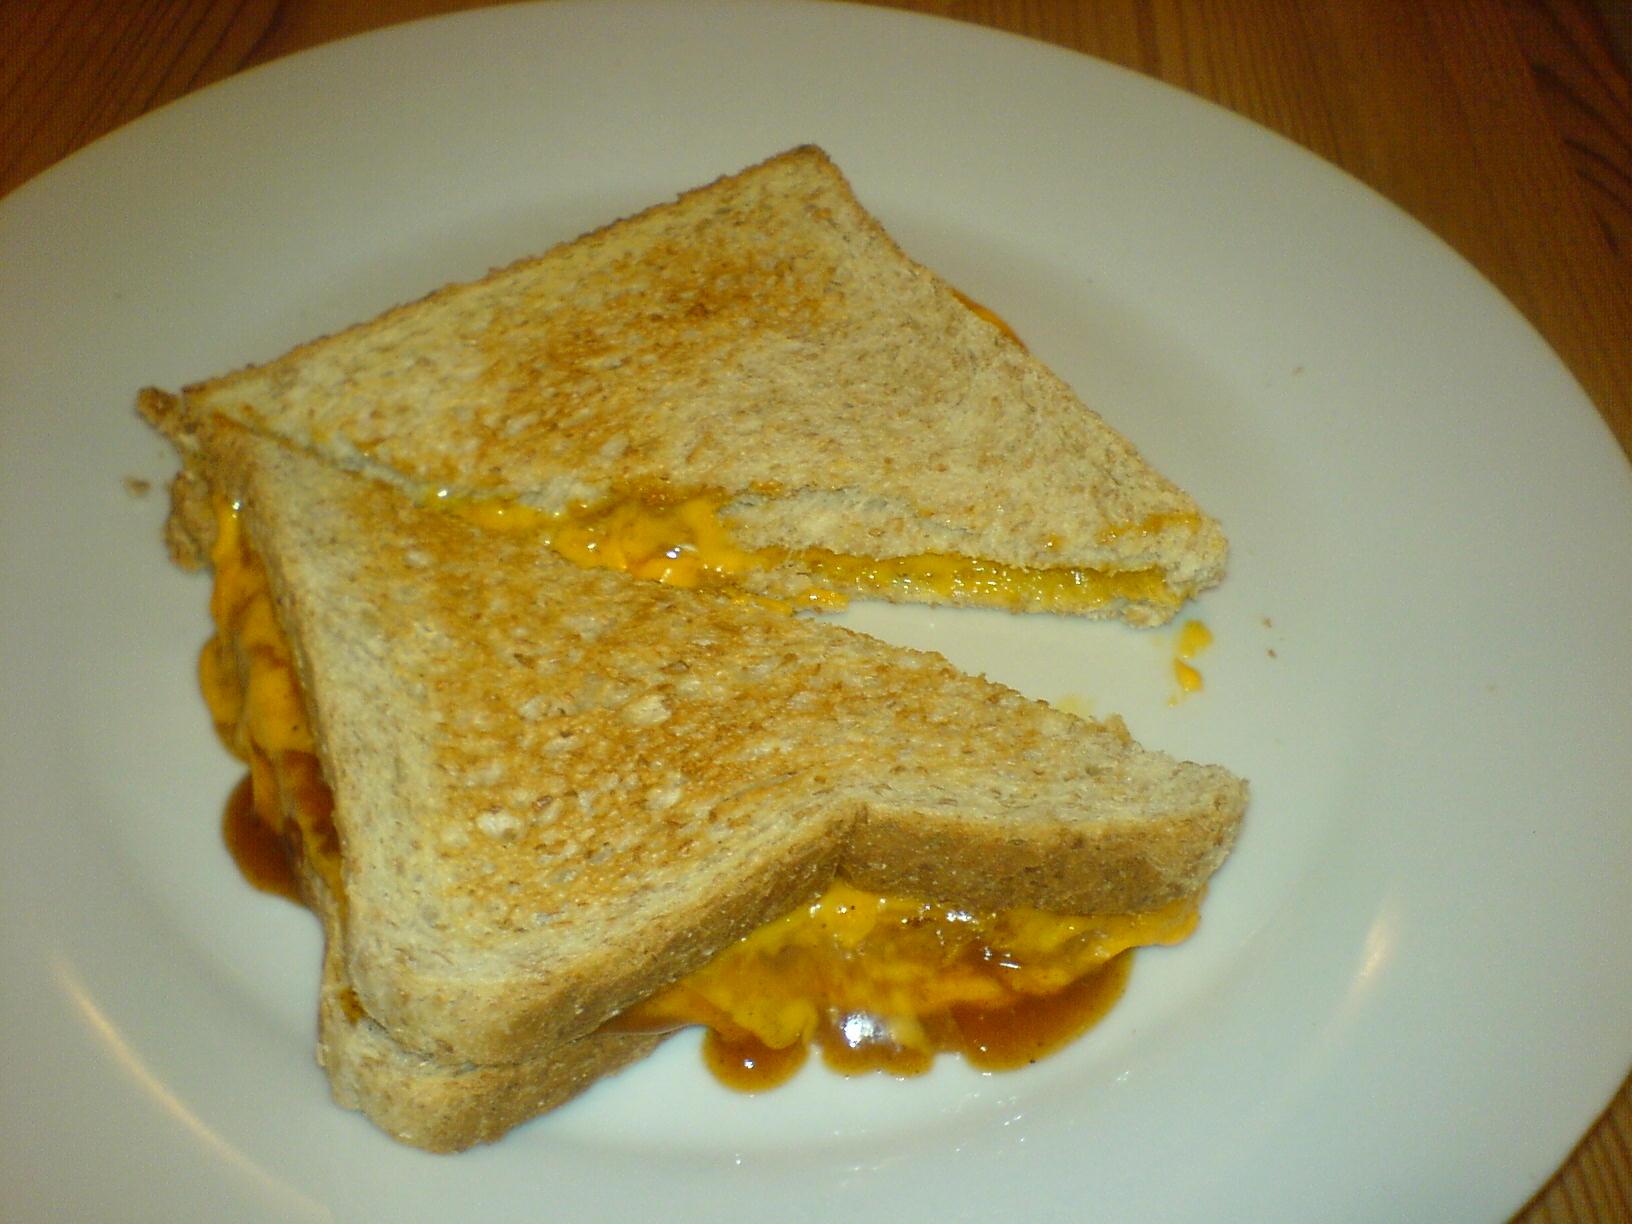 http://foodloader.net/Holz_2009-08-09_Kaese-Ketchup-Toasts.jpg